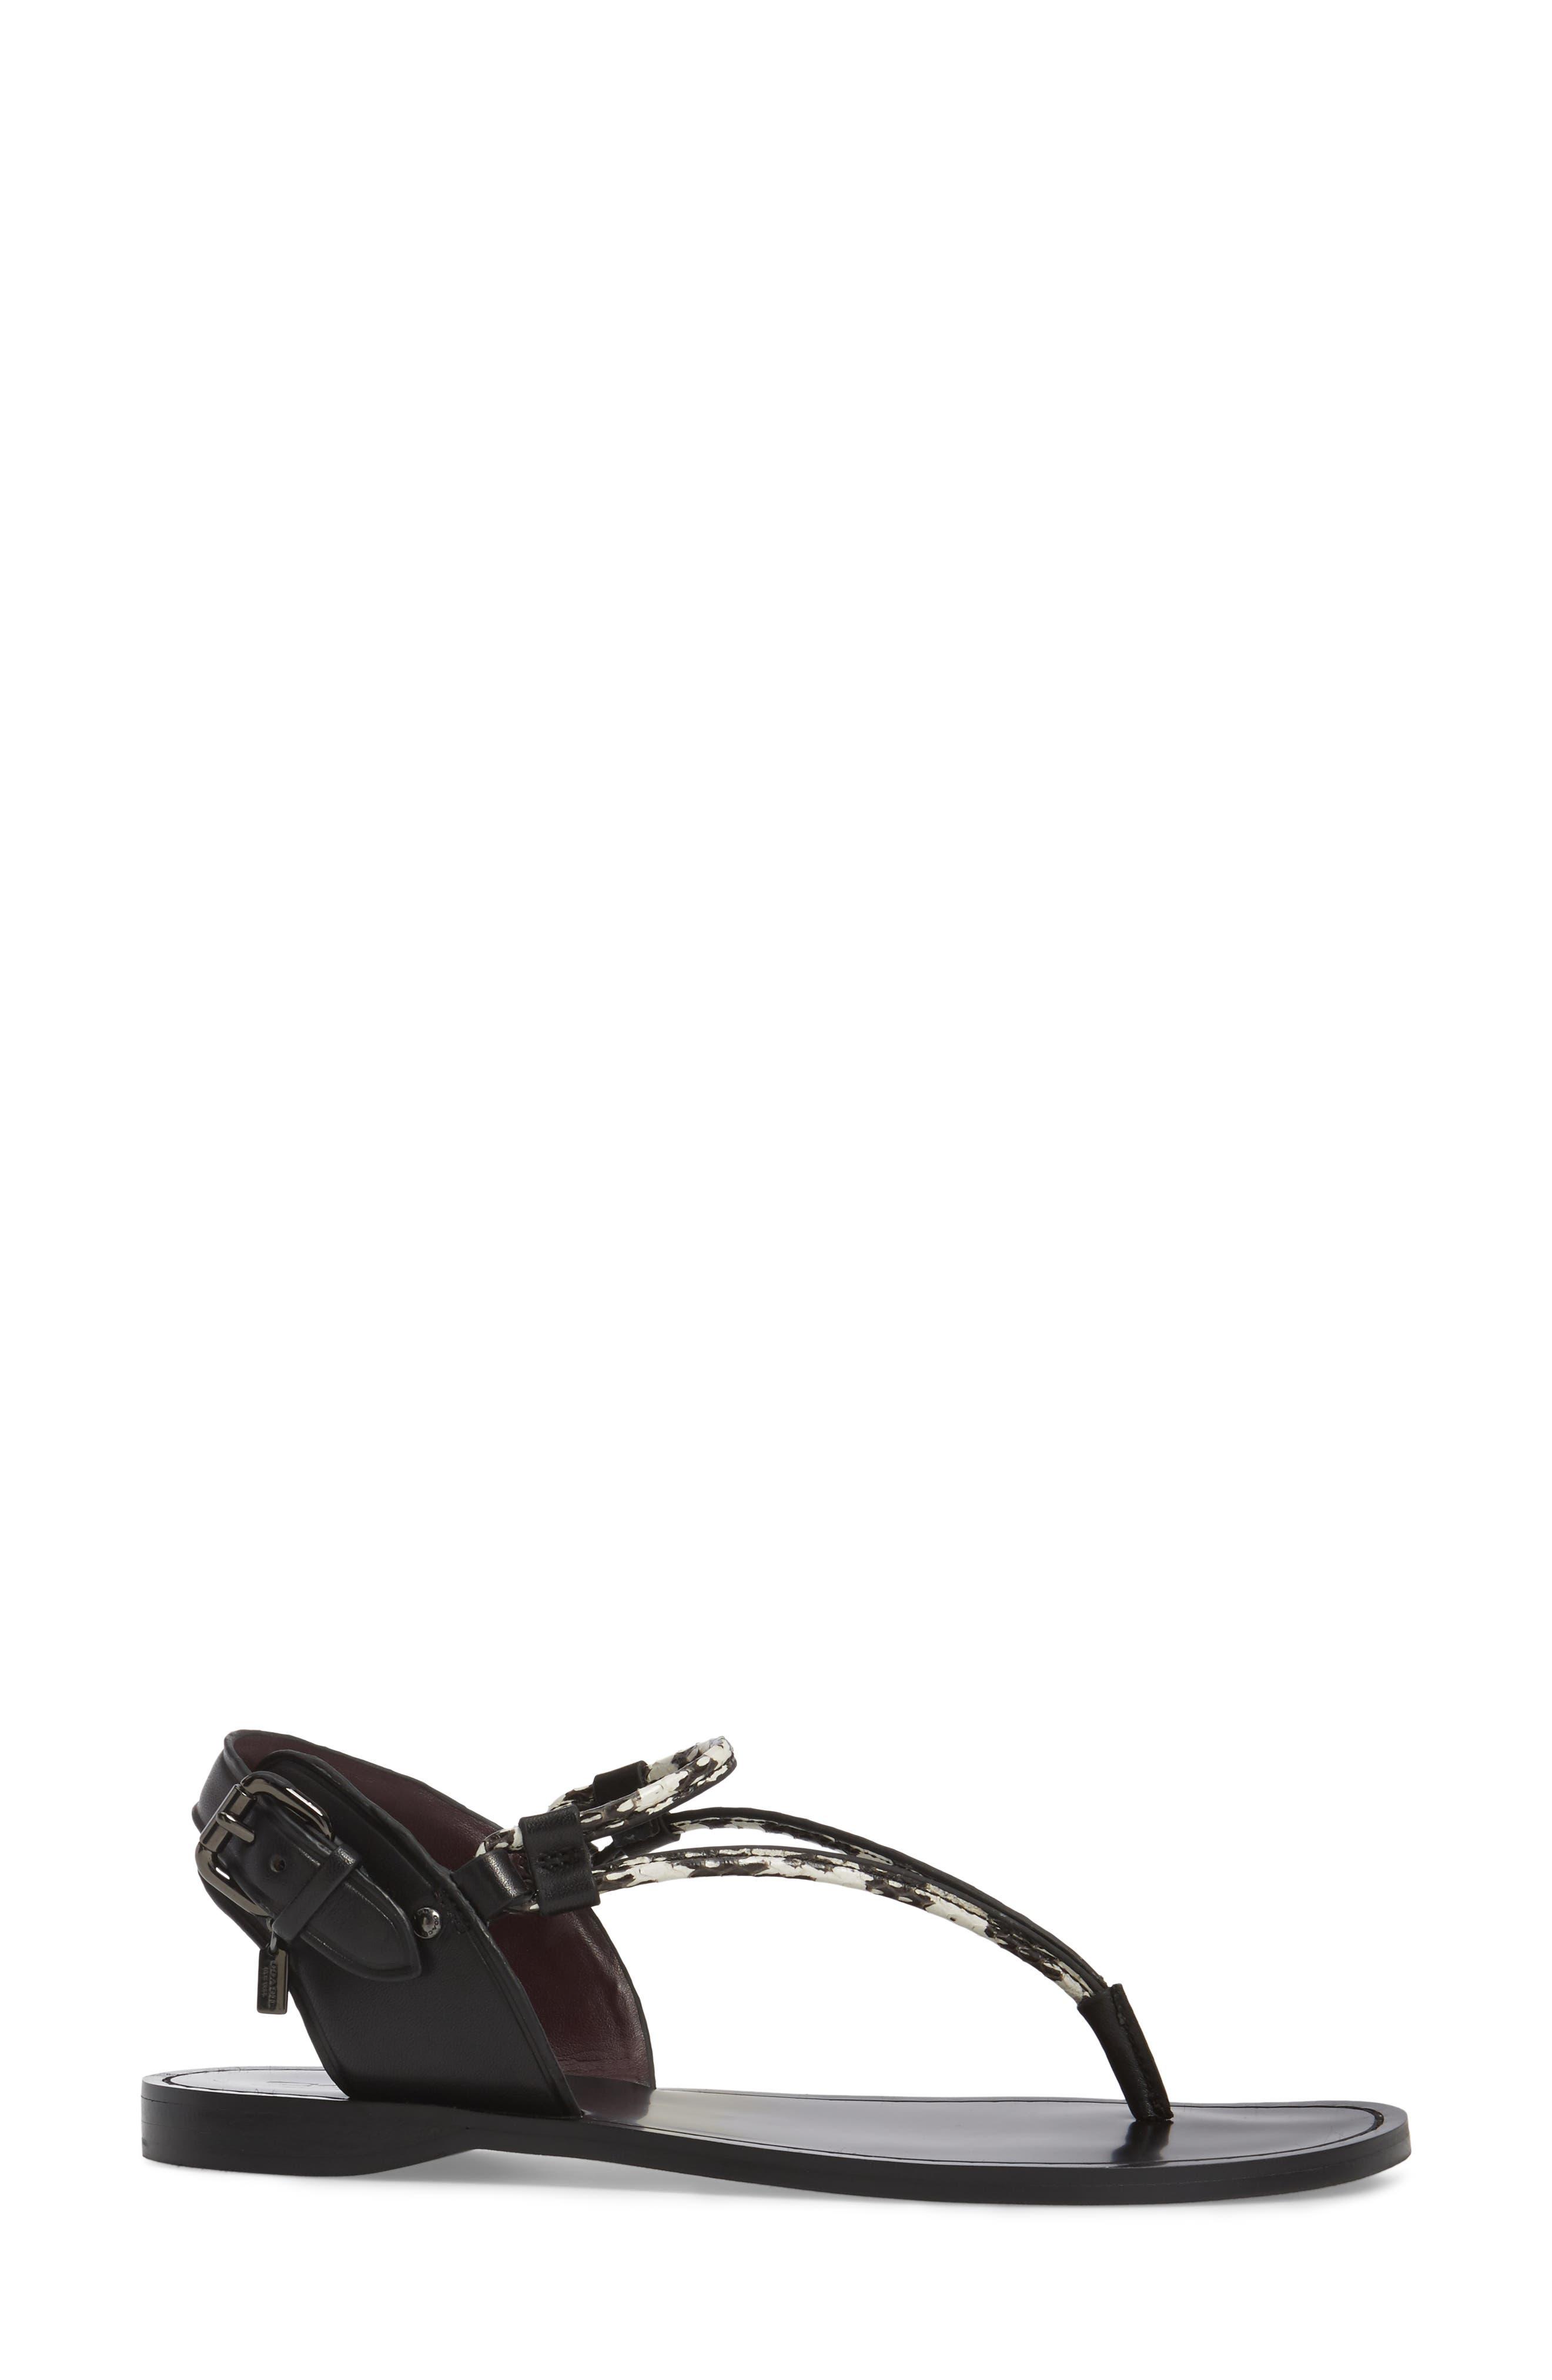 Alternate Image 3  - COACH 'Clarkson' Sandal